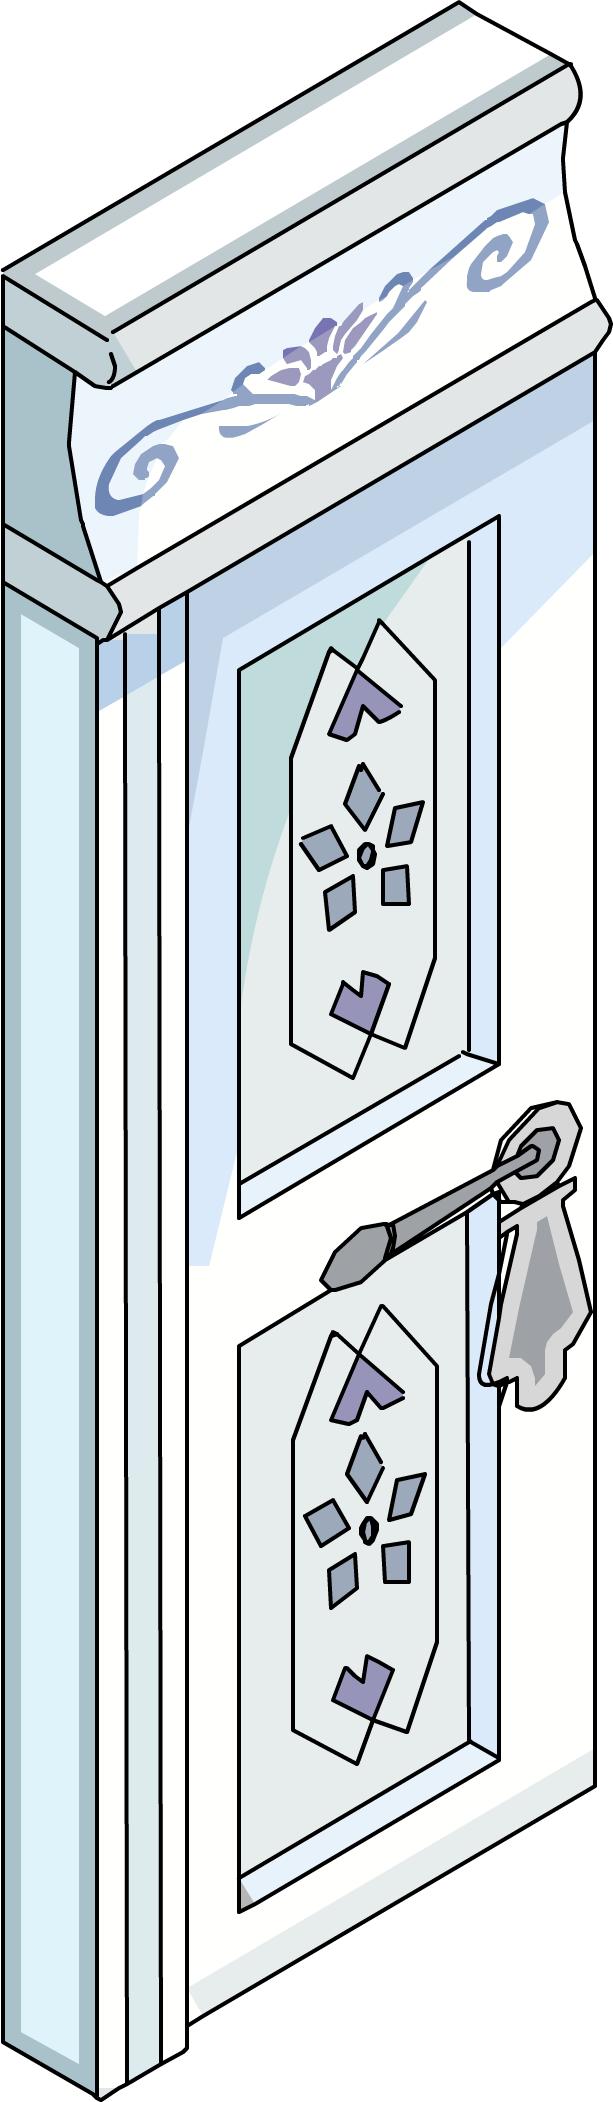 Left Princess Door  sc 1 st  Club Penguin Wiki - Fandom & Left Princess Door | Club Penguin Wiki | FANDOM powered by Wikia